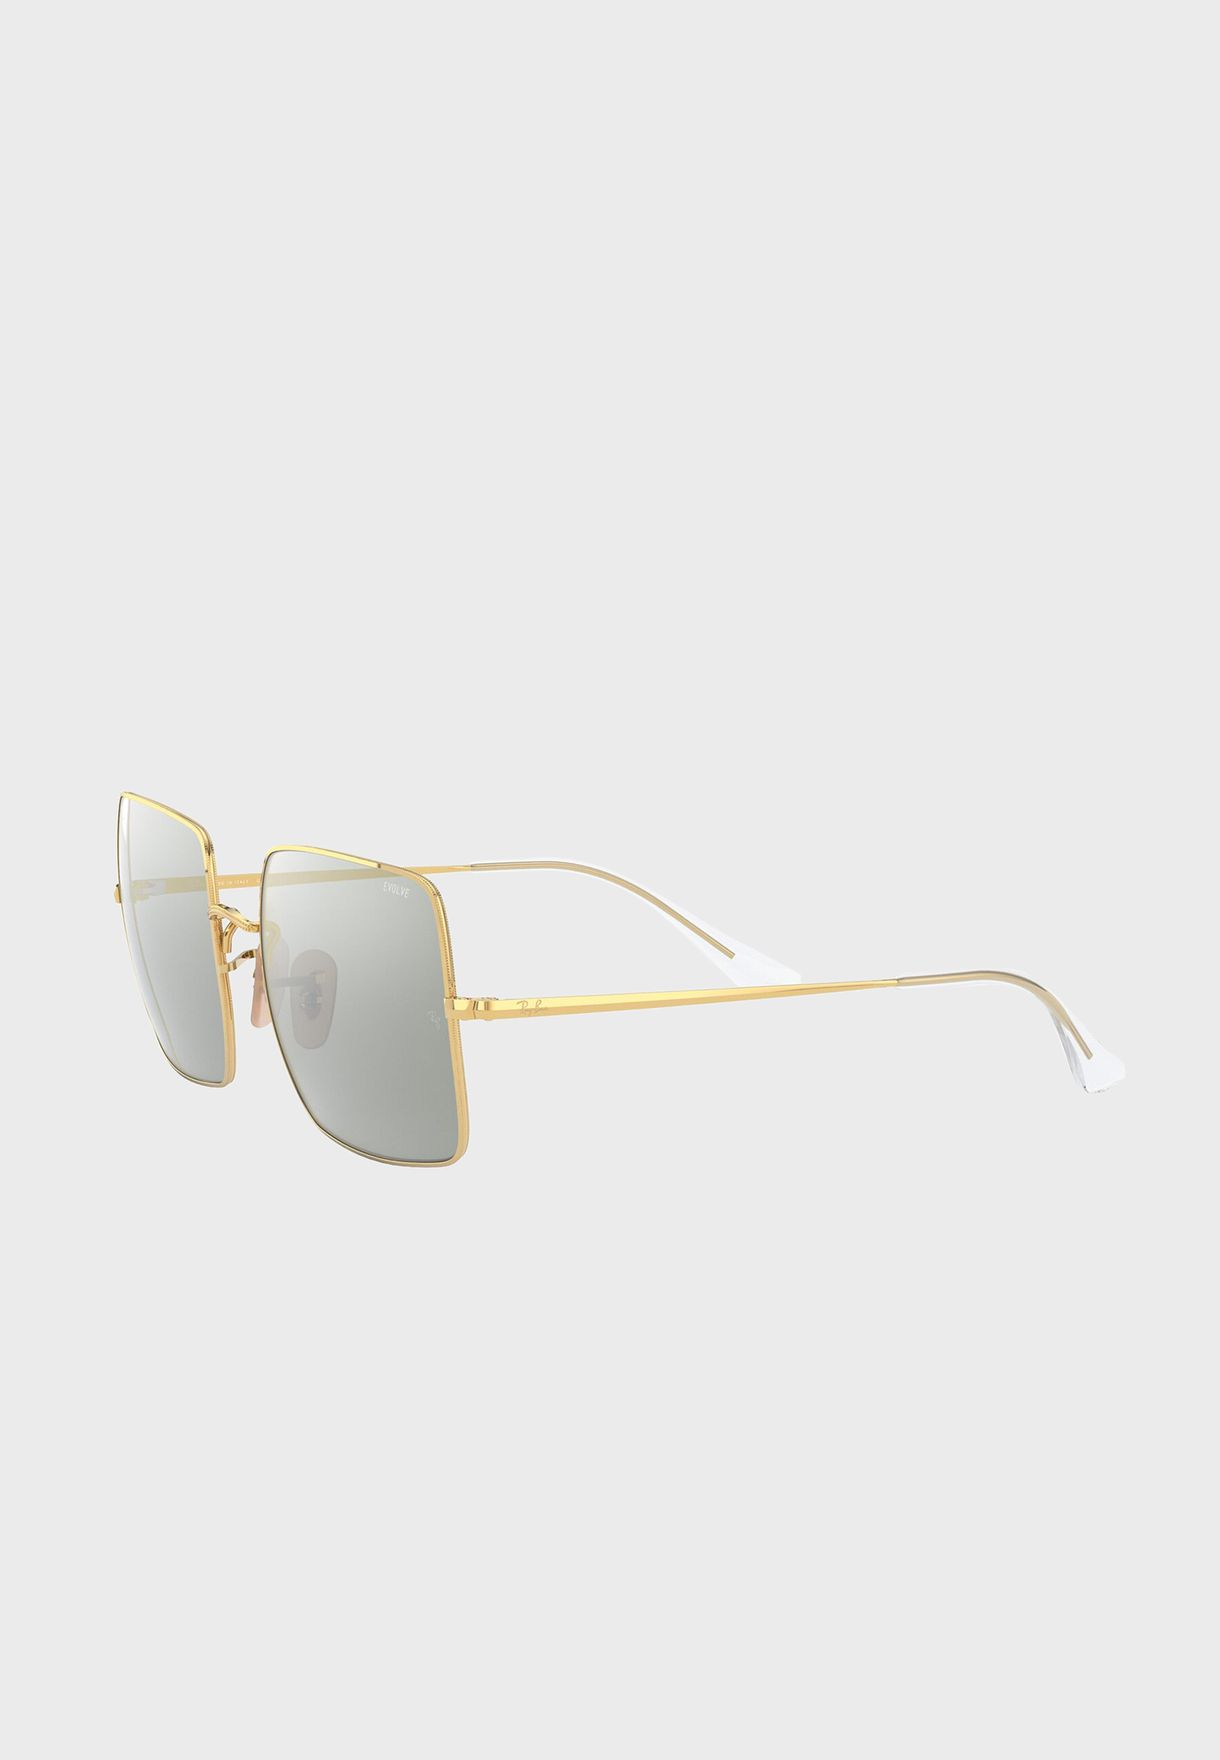 0RB1971 Square Oversized Sunglasses